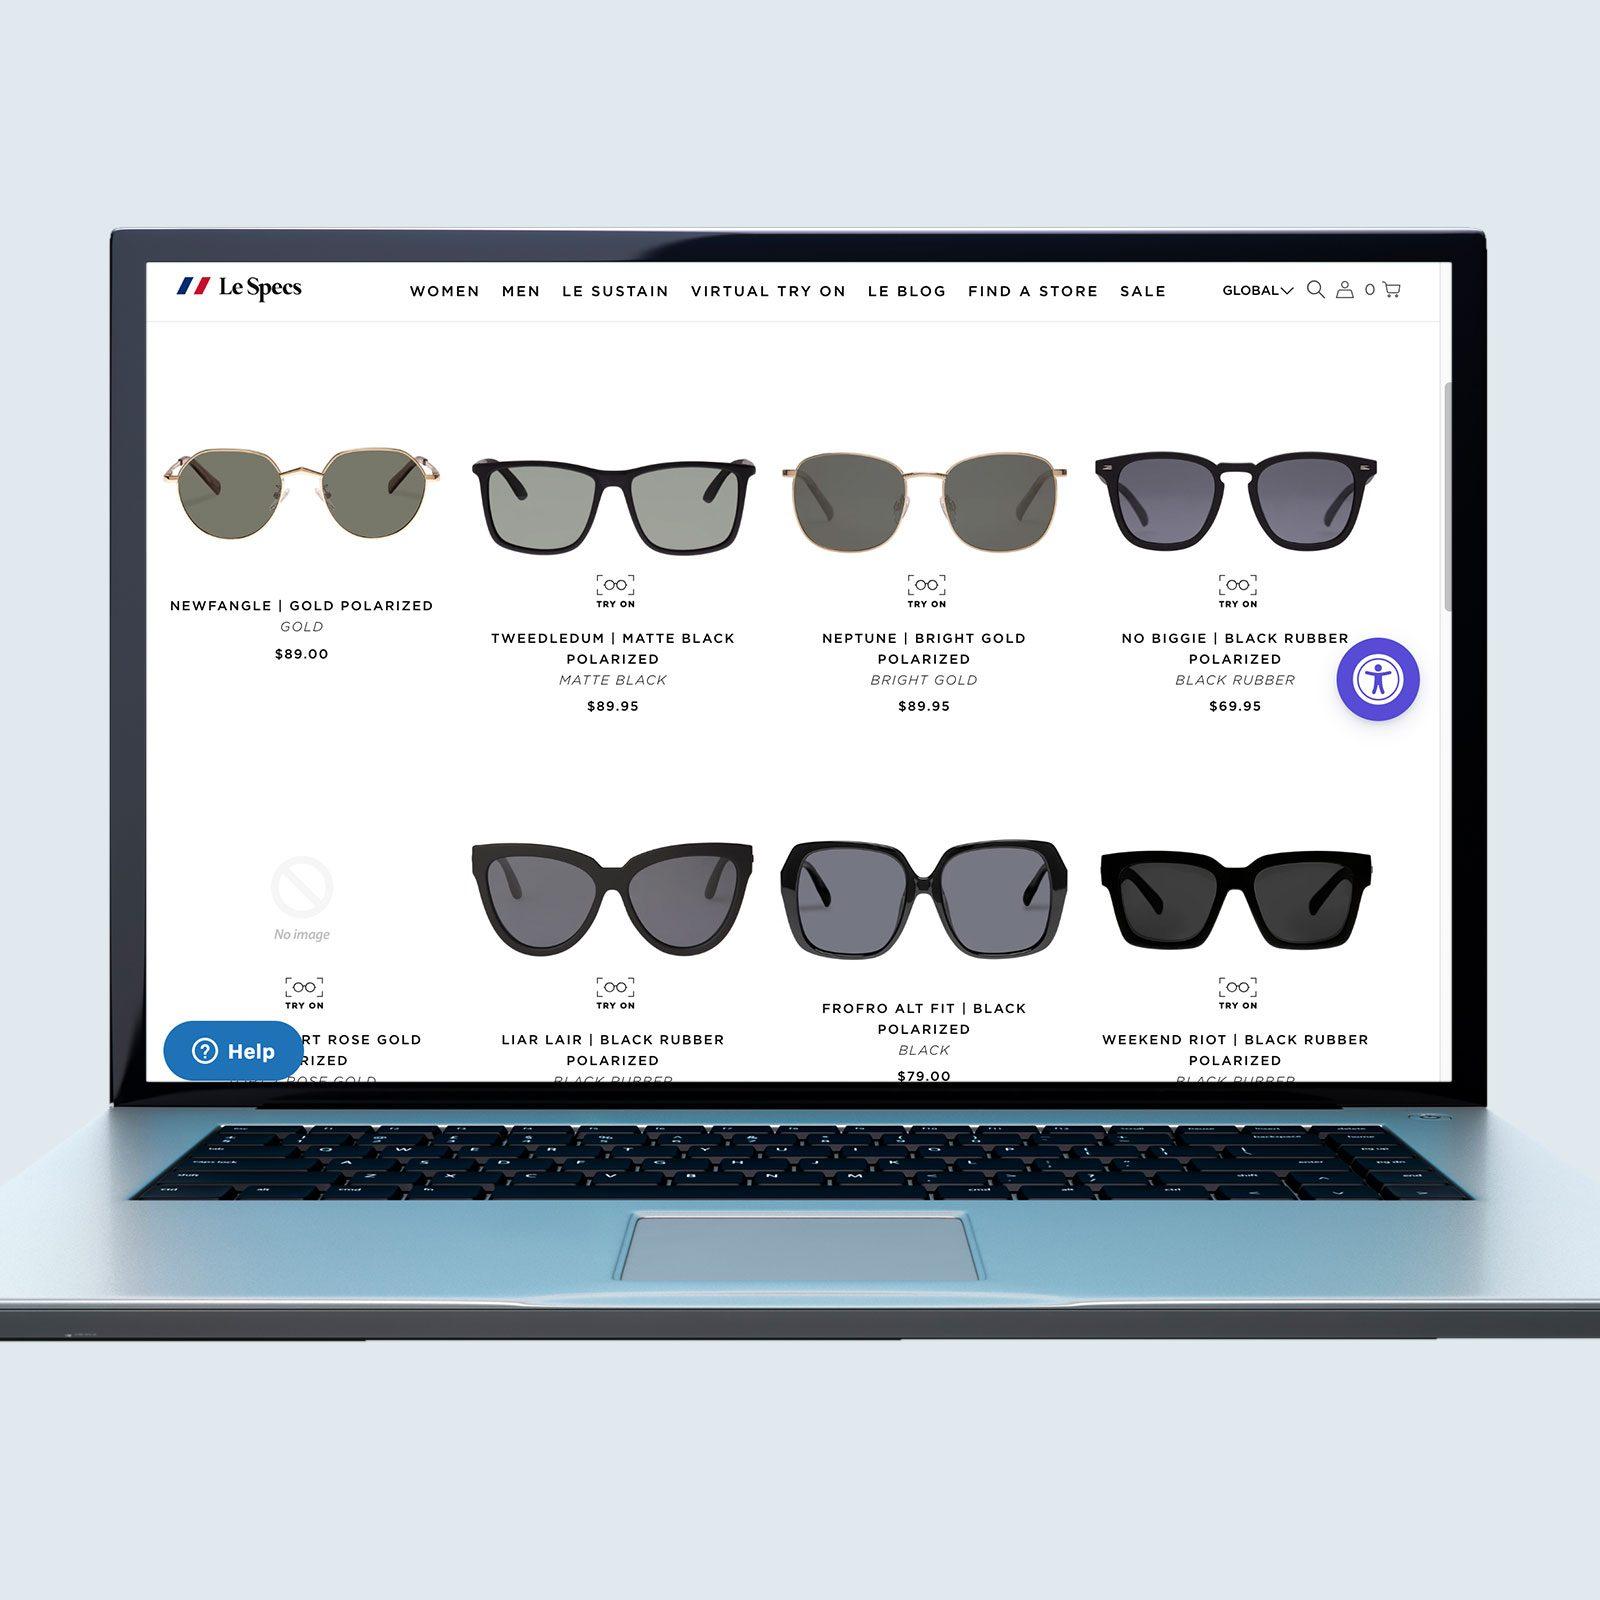 Le Specs Polarized Sunglasses